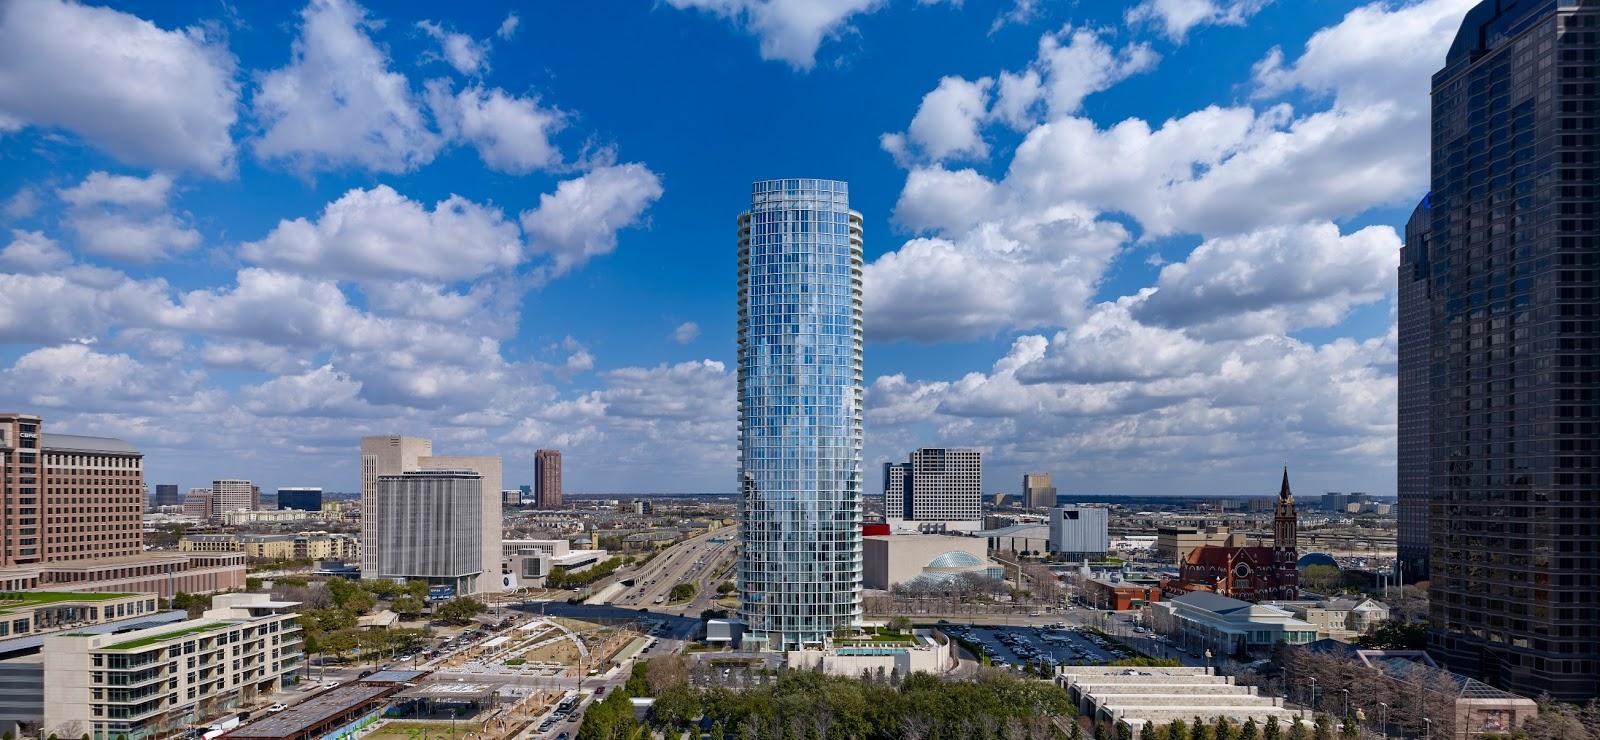 April 2013 Museum Tower Dallas